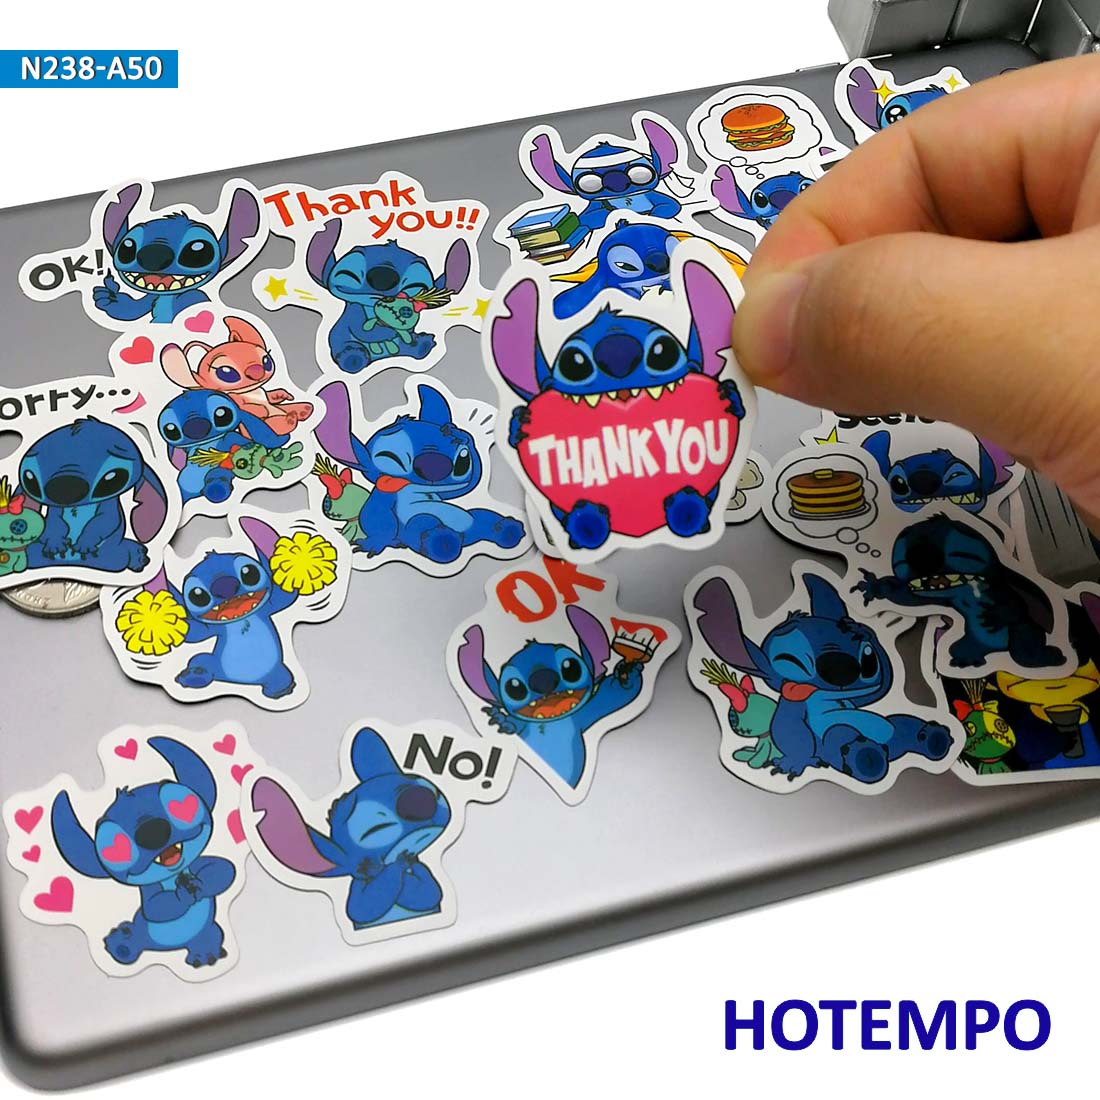 50pcs Cute Lilo Stitch Stickers Cartoon Stationery Anime Scrapbooking for Children Mobile Phone Laptop Guitar Skateboard Bike(China)